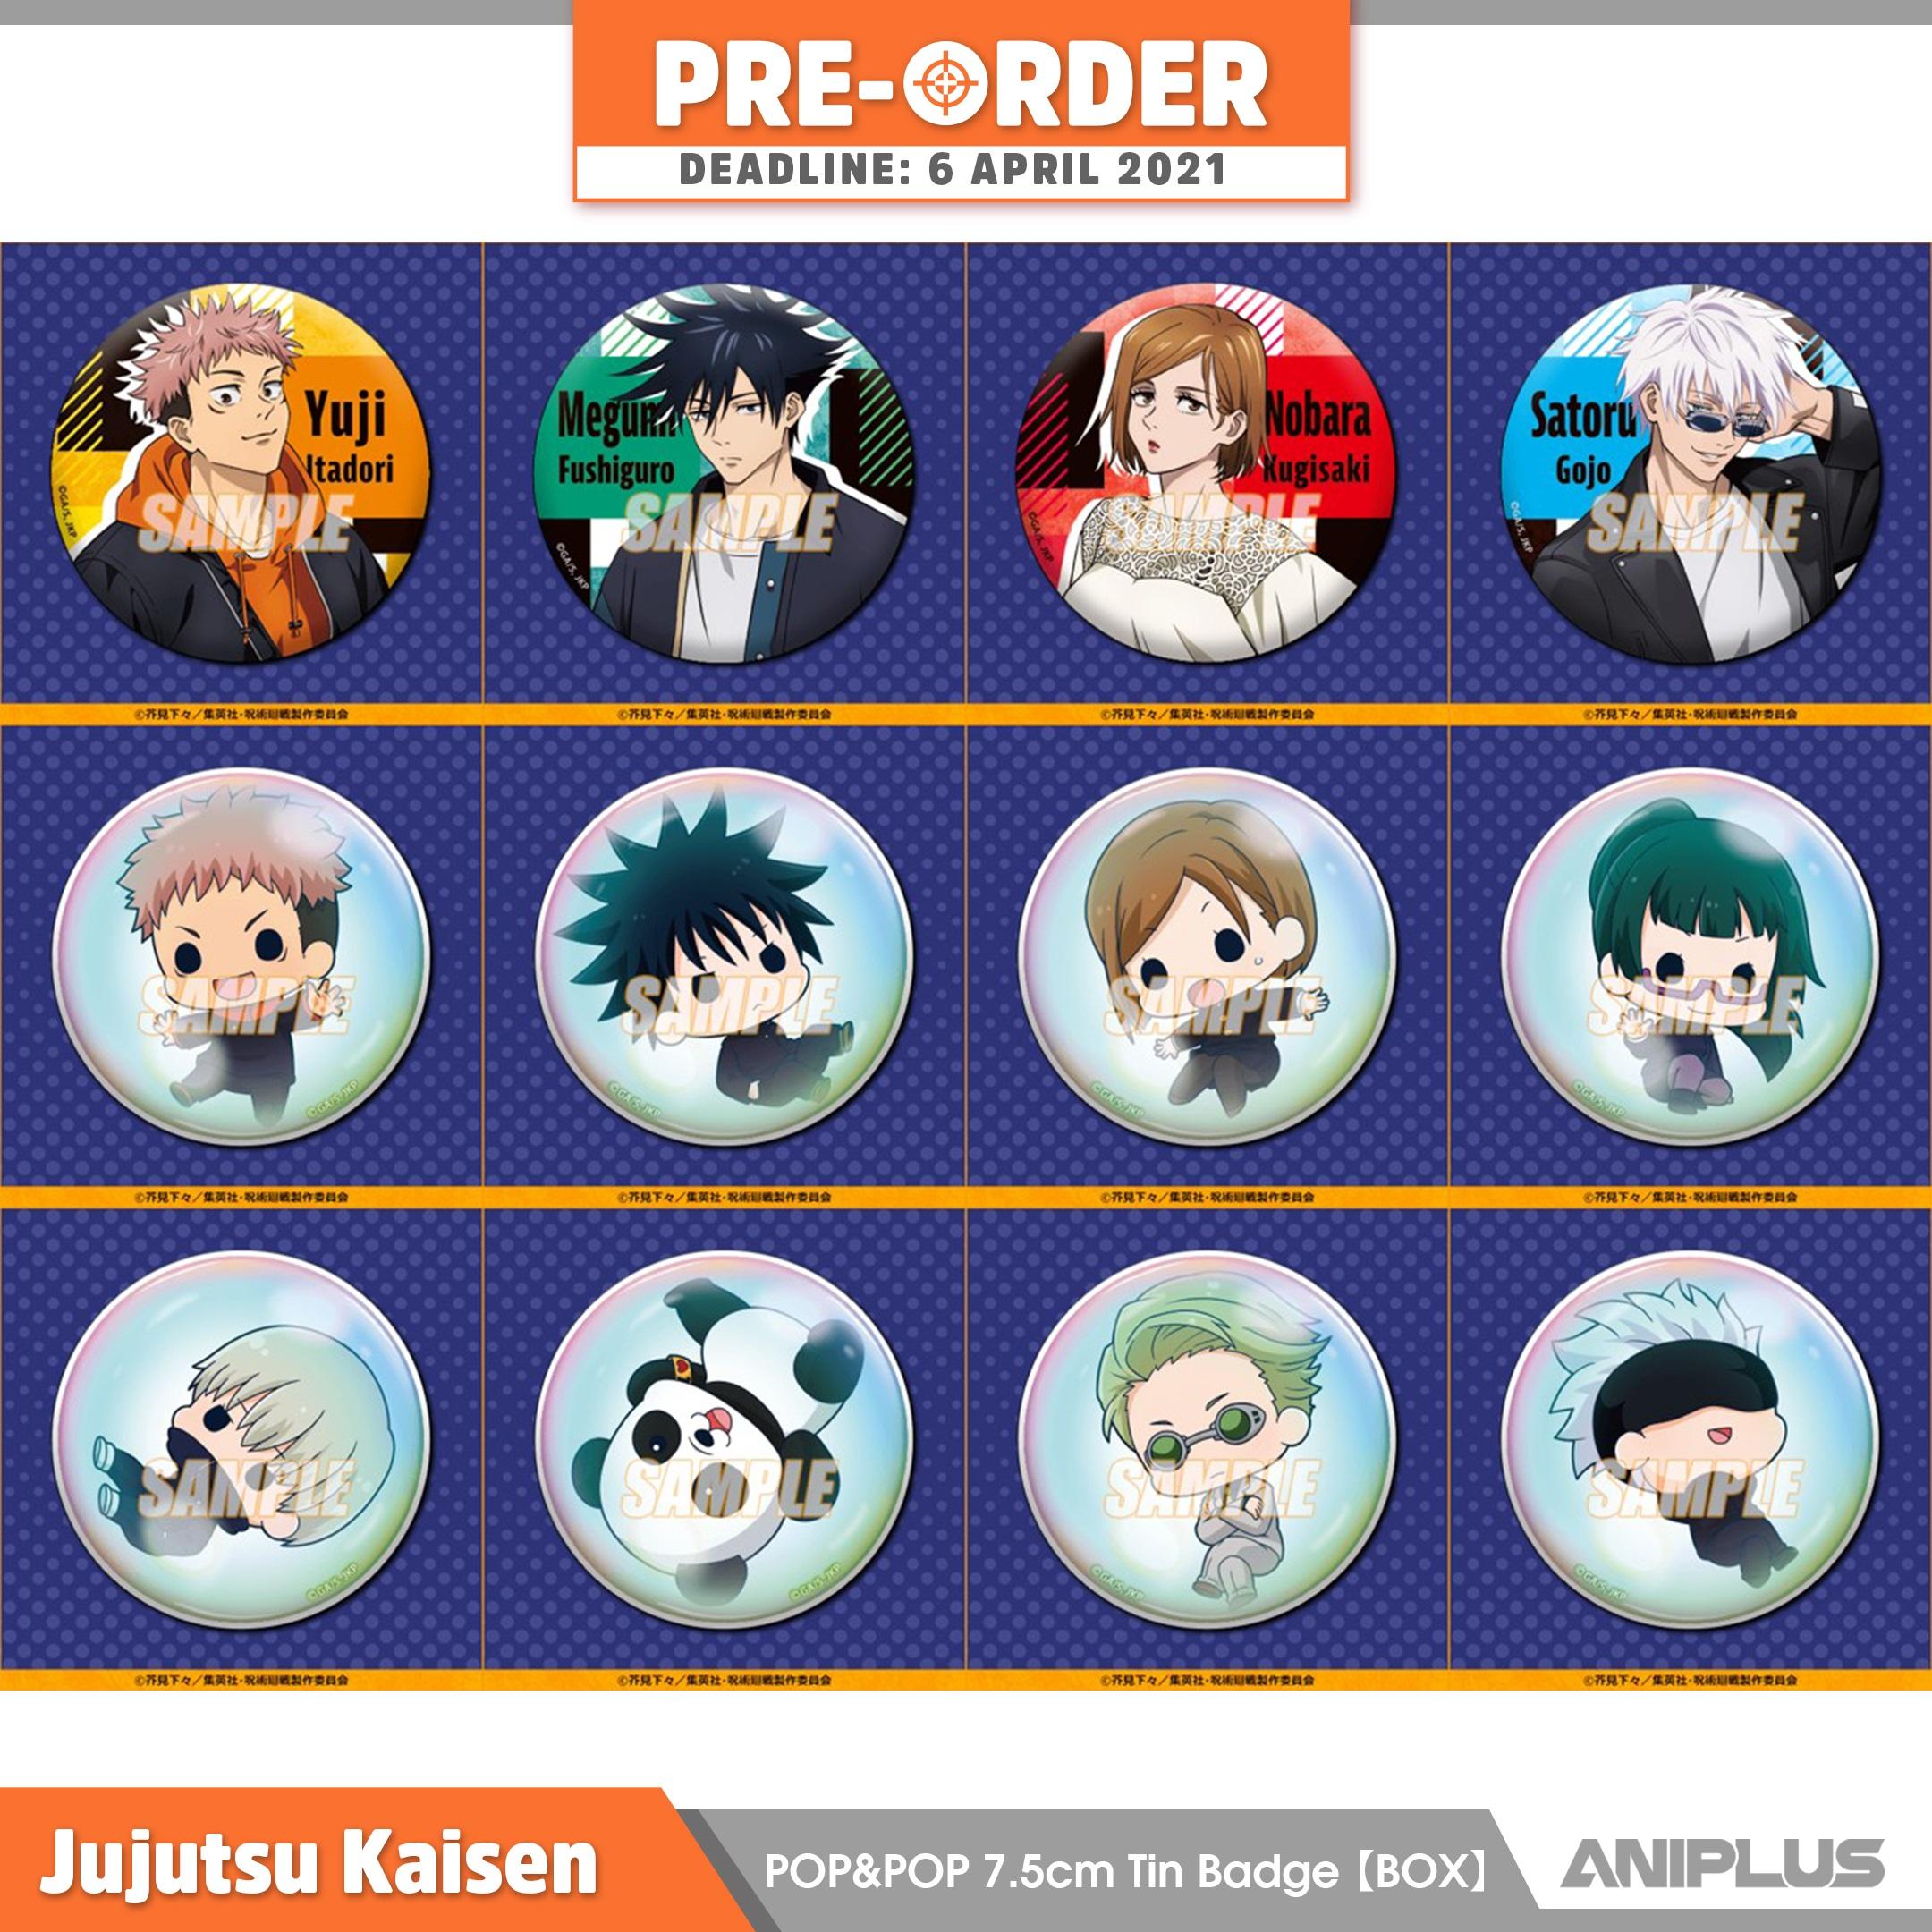 Jujutsu Kaisen POP&POP 7.5cm Tin Badge Box